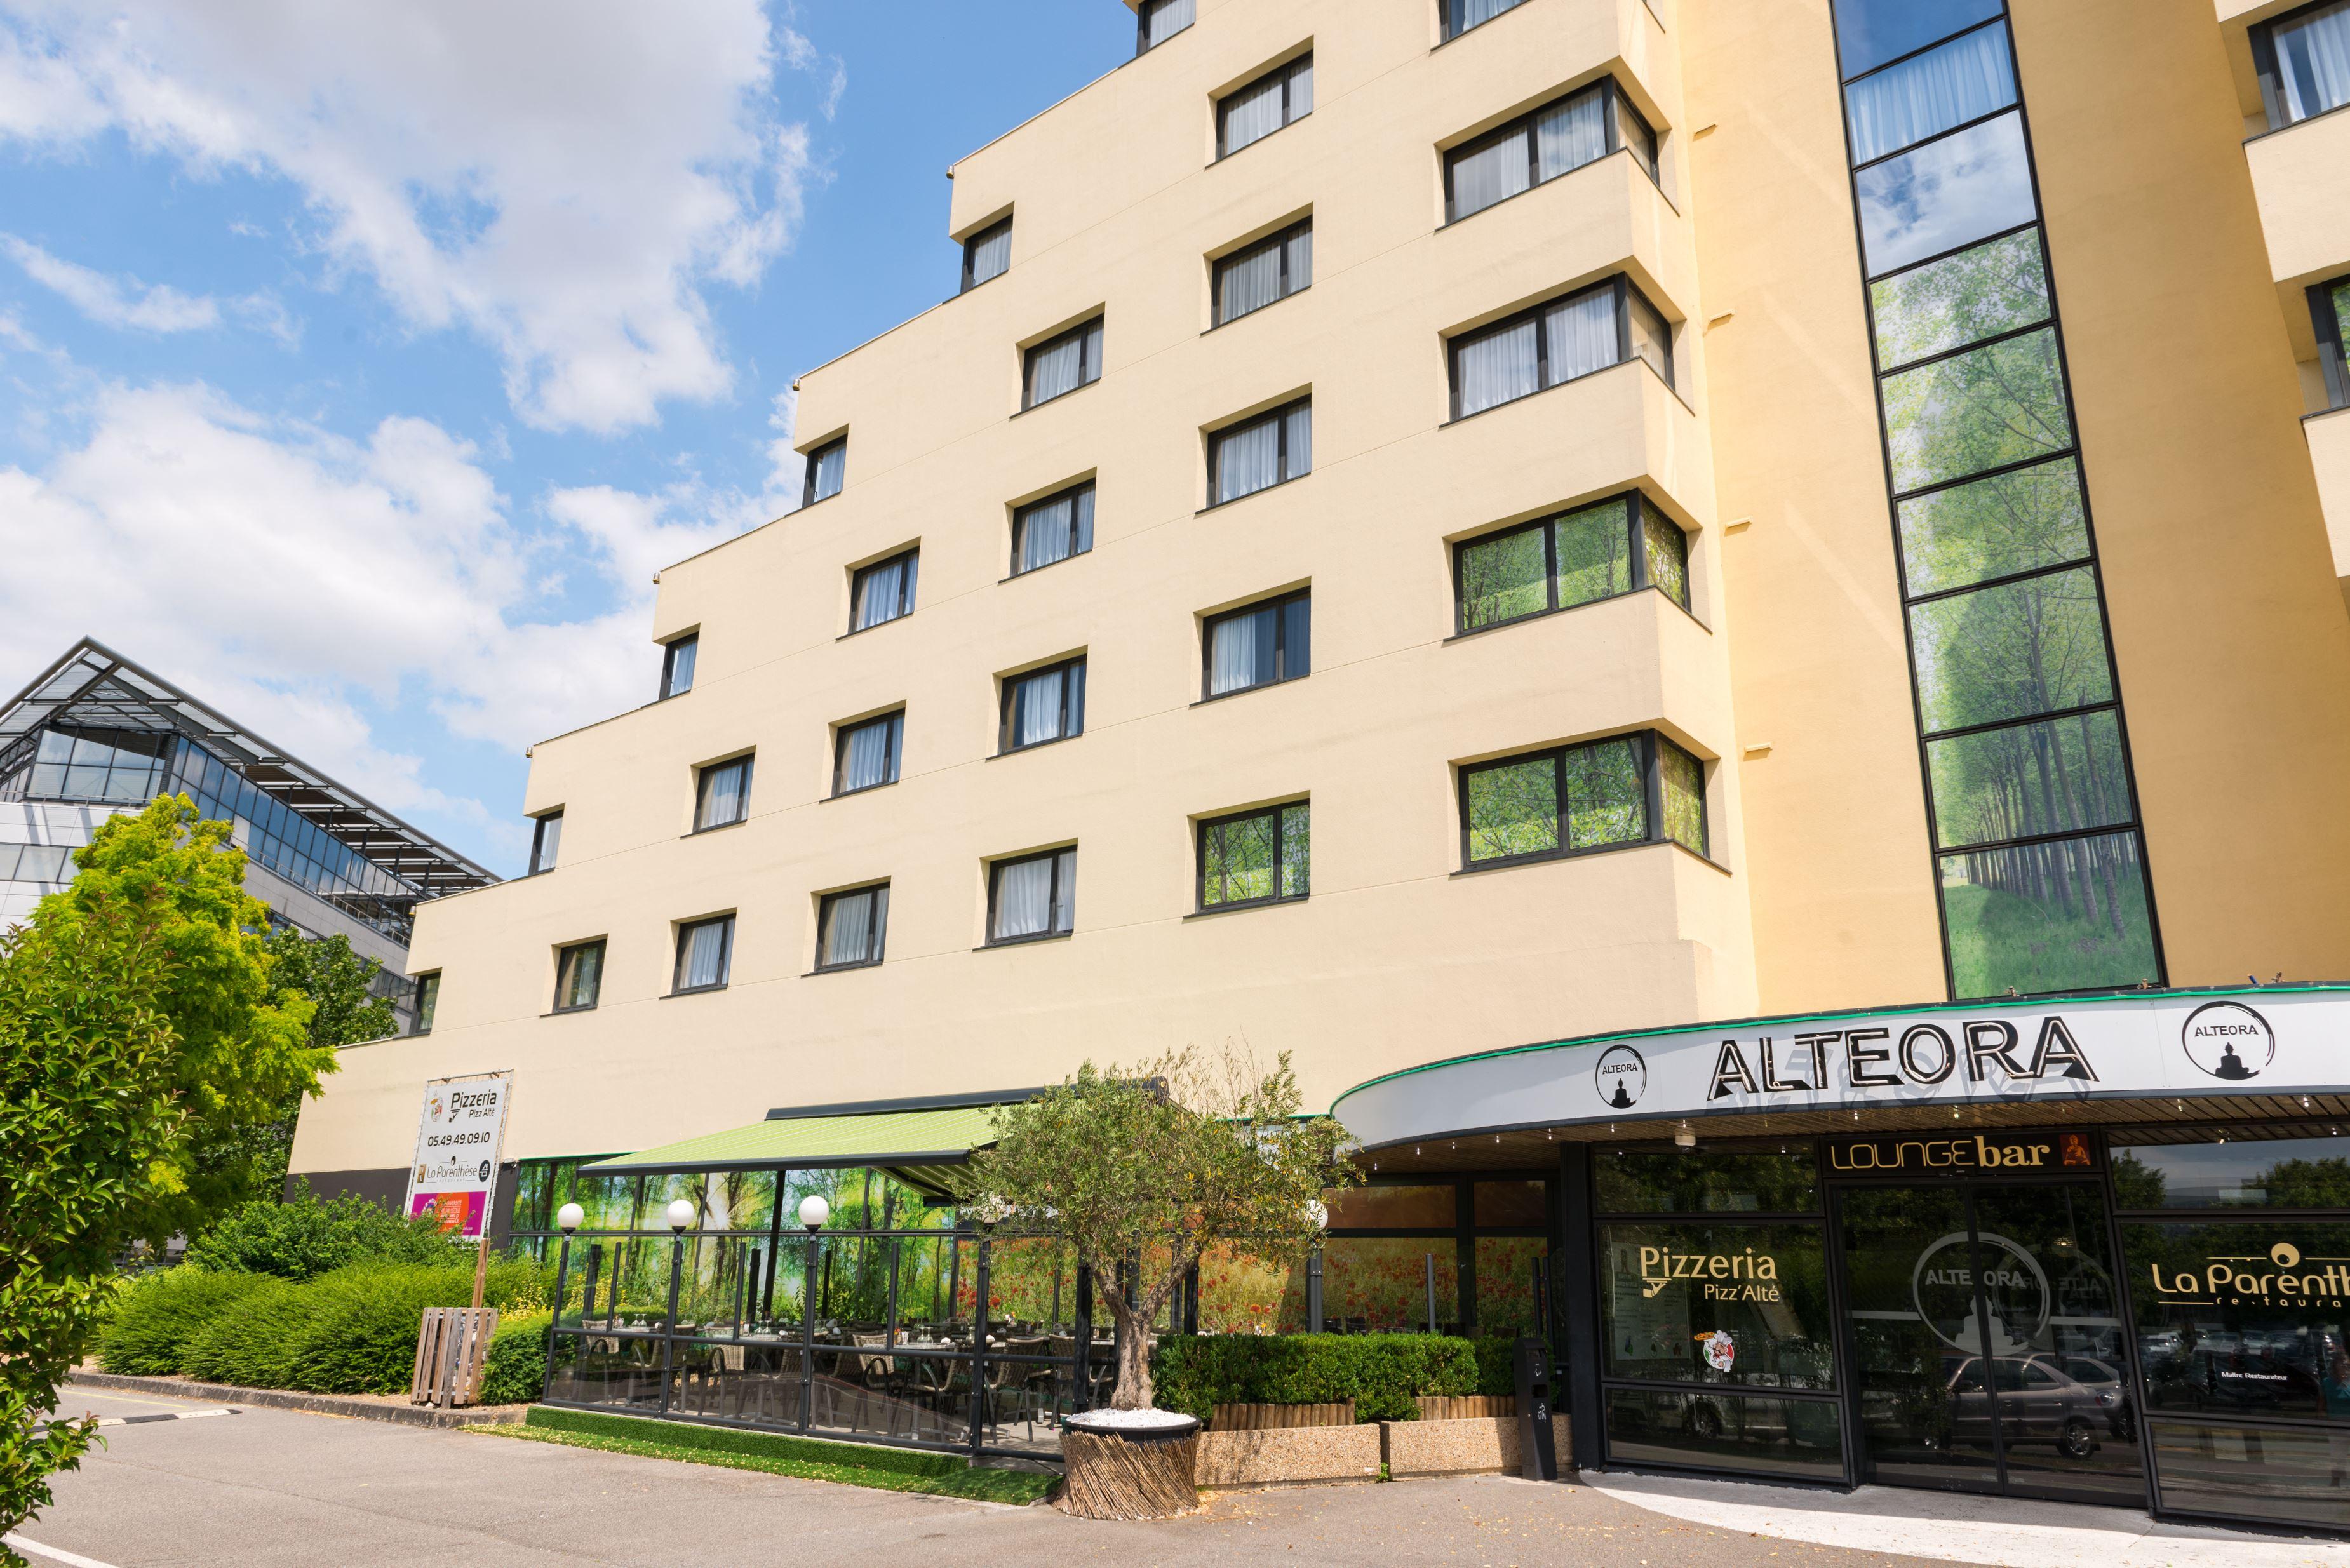 Hôtel Altéora Site du Futuroscope